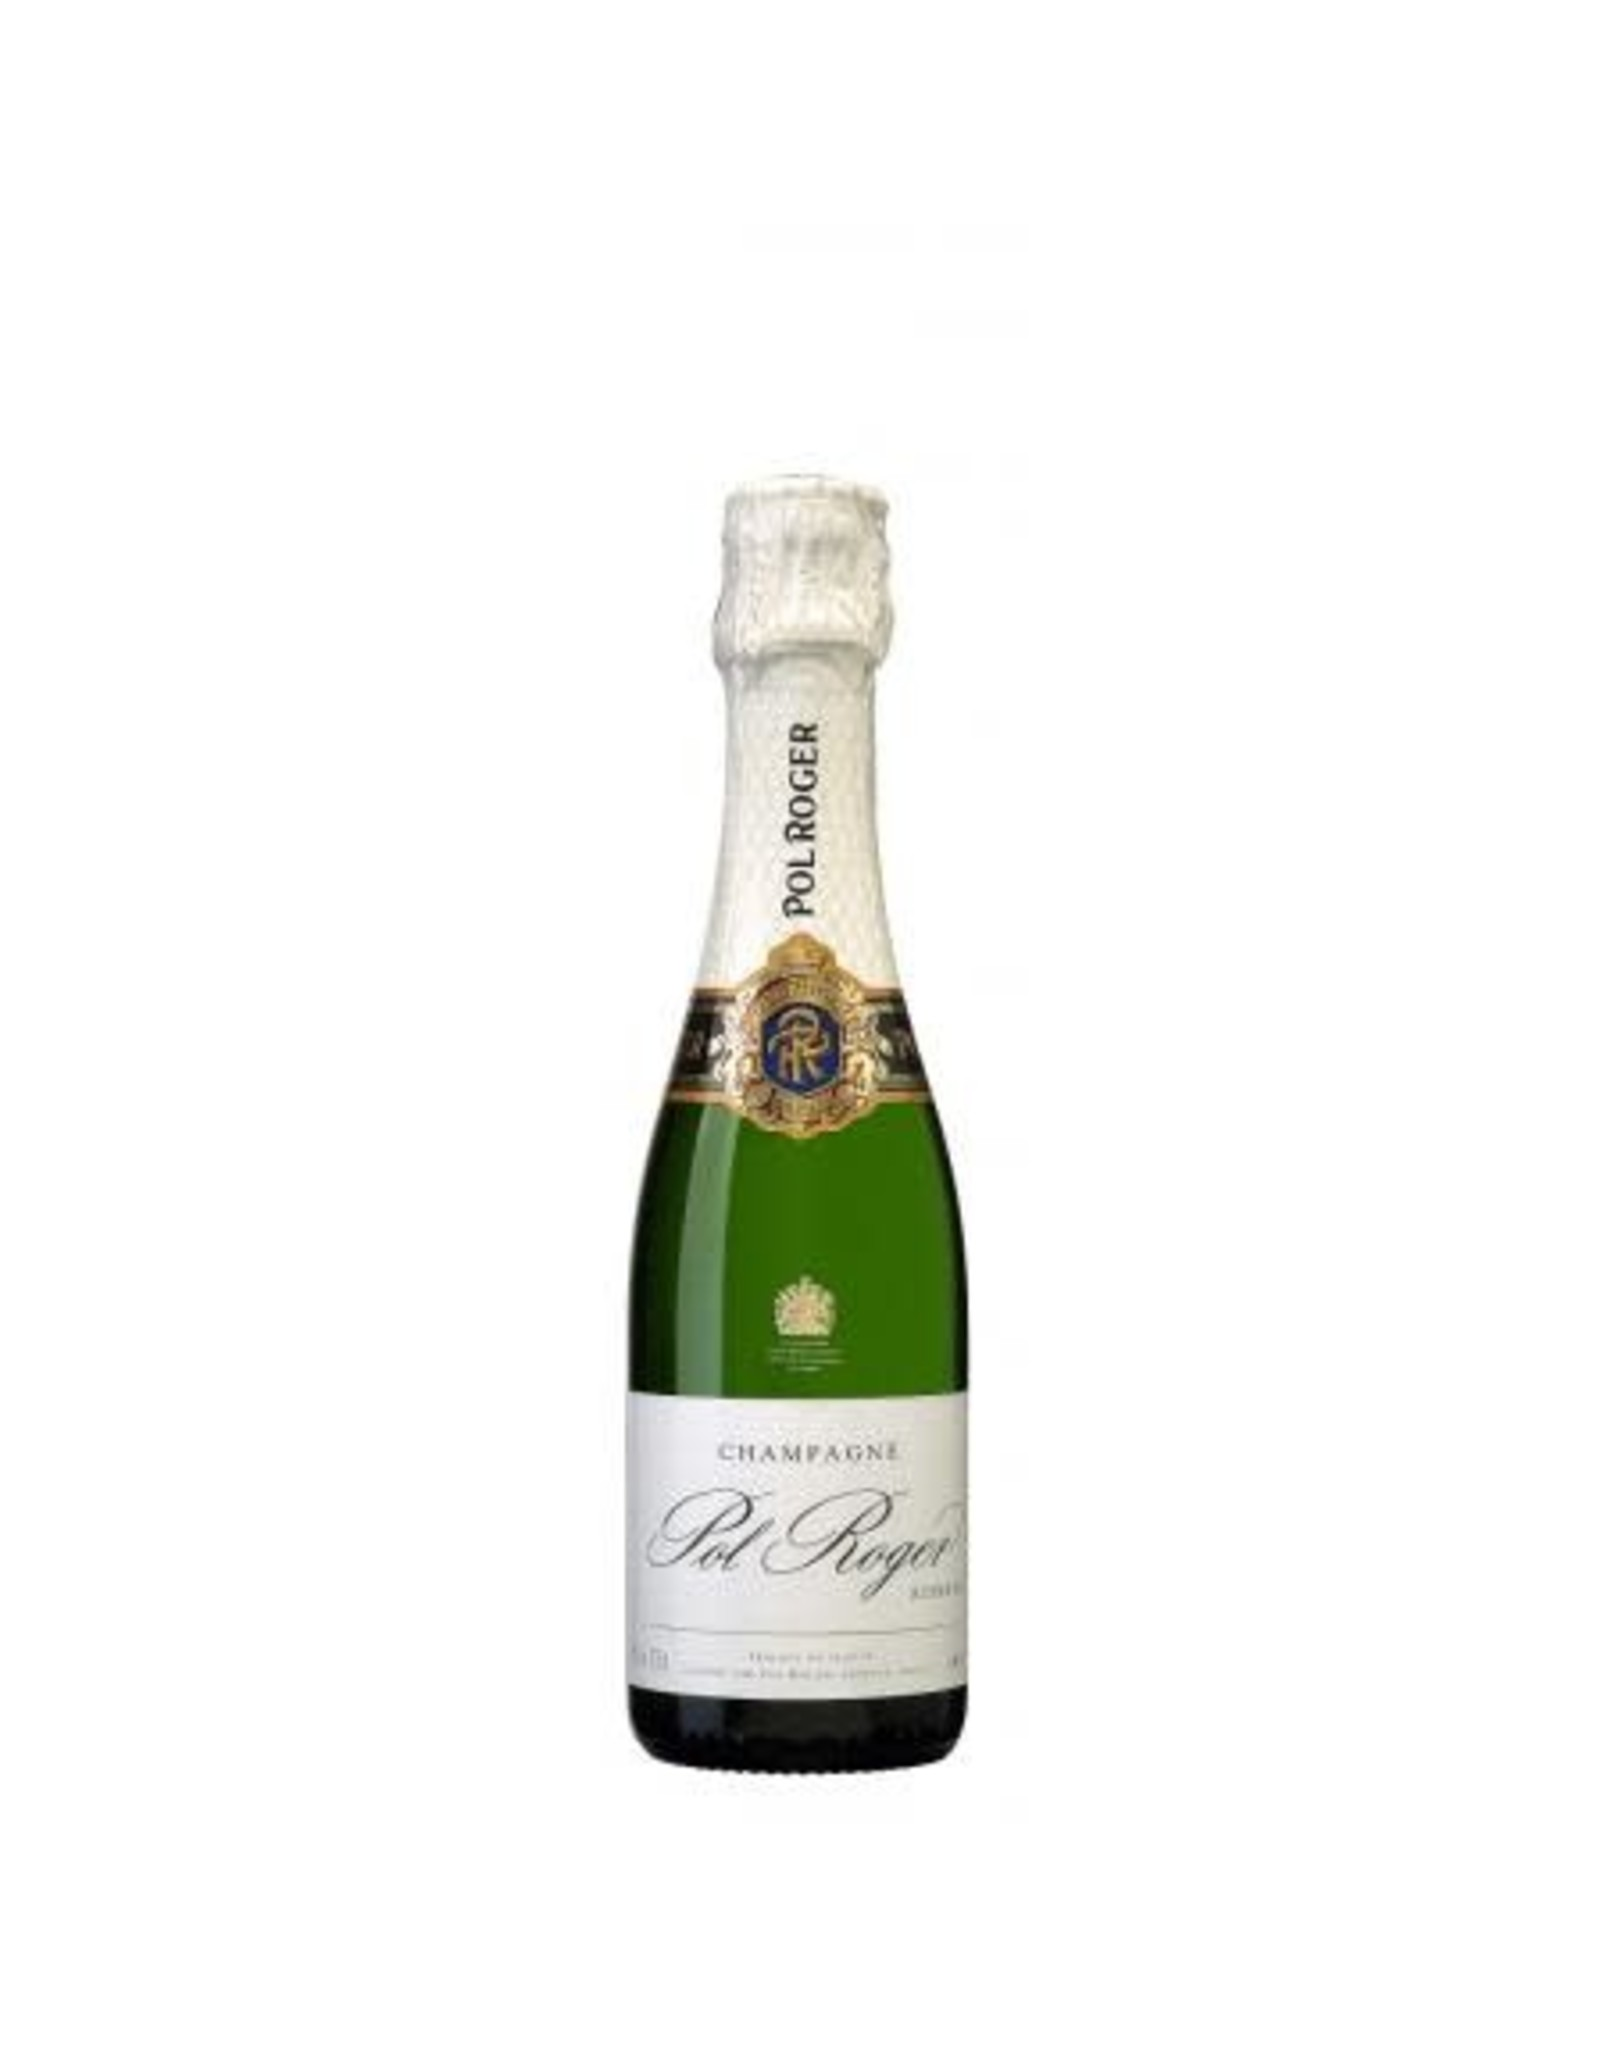 France Champagne Pol Roger NV Brut 375ml